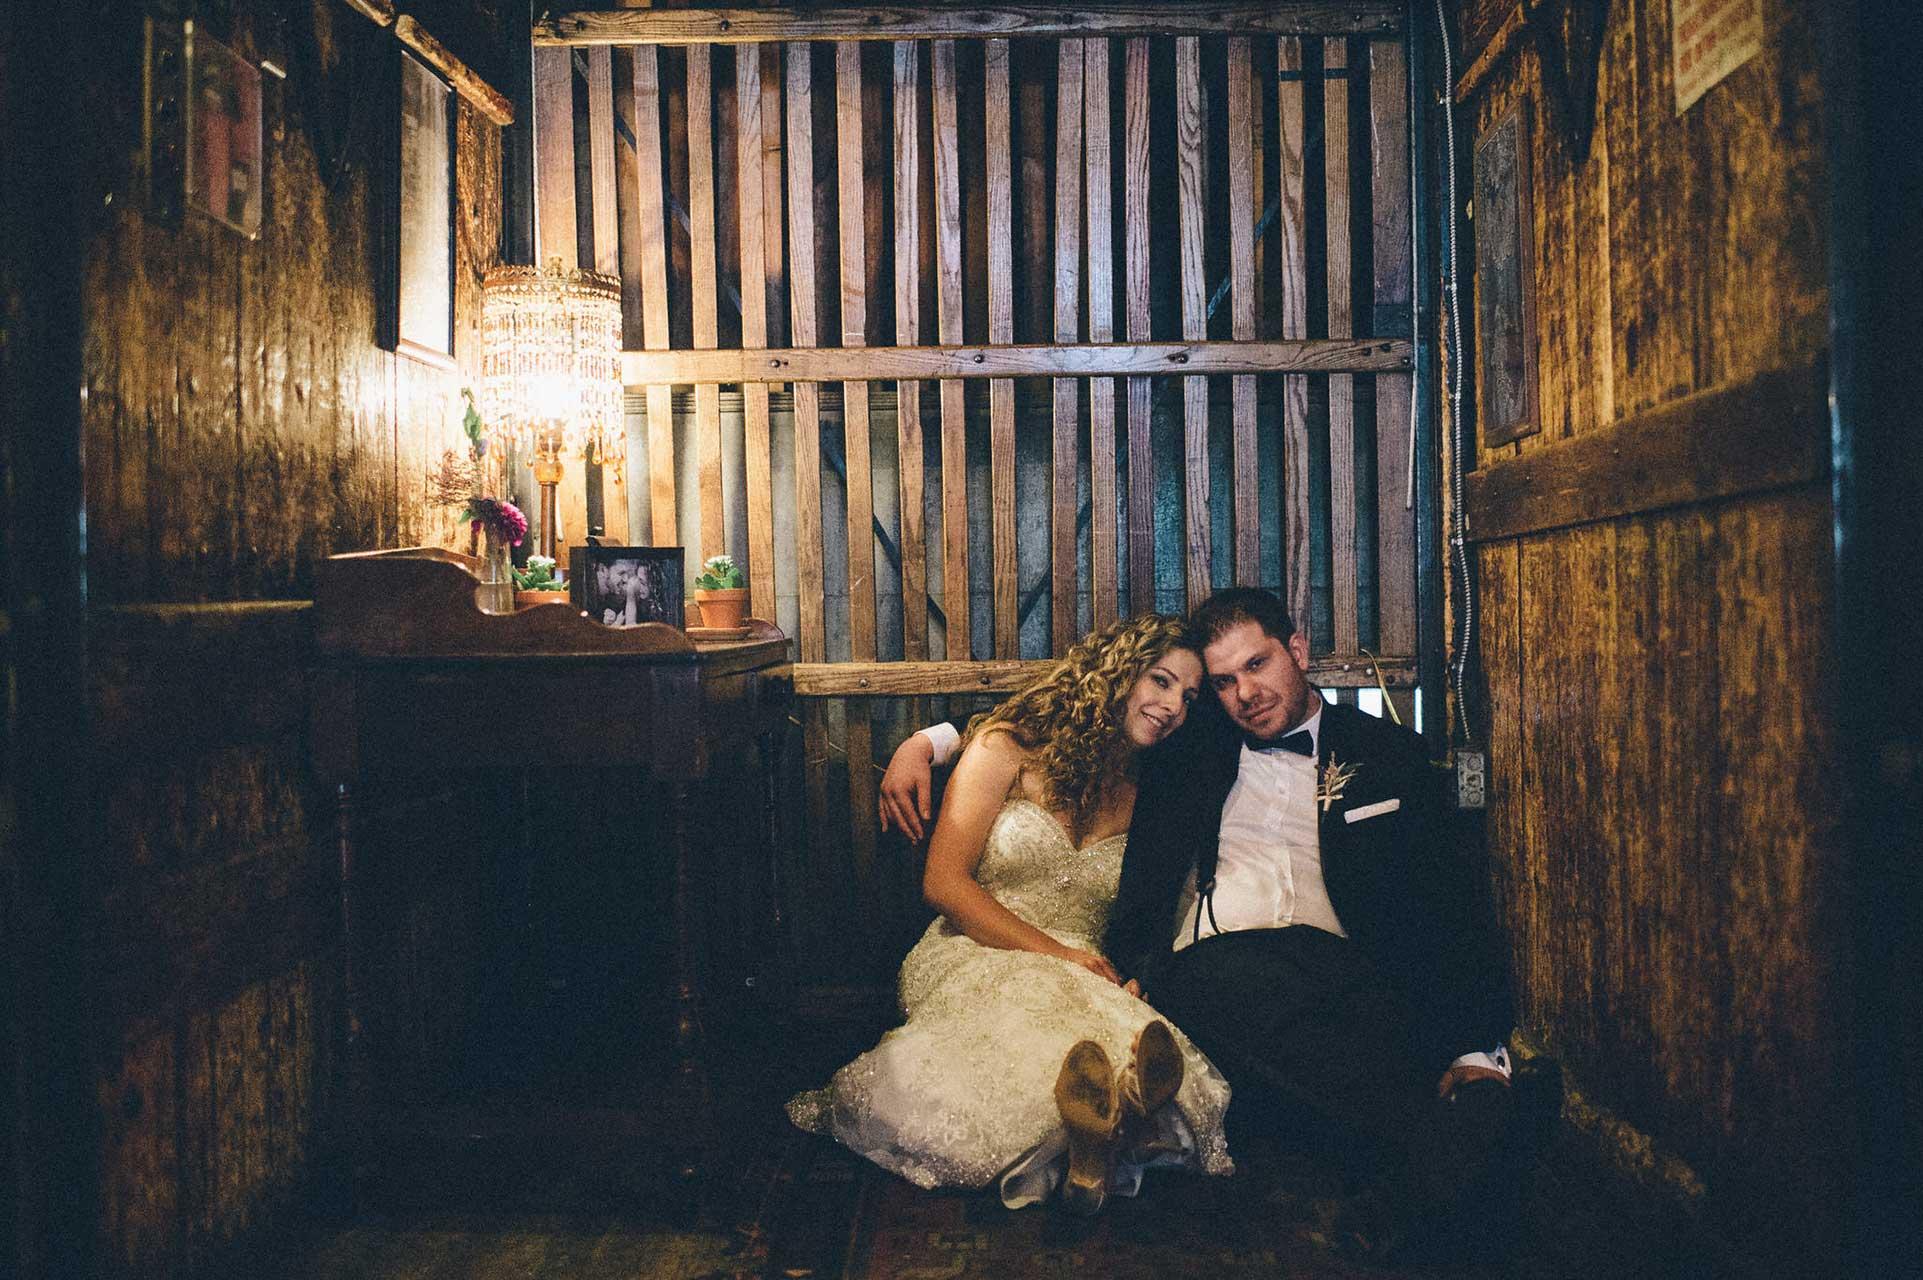 Unique Wedding Venues Toronto - Heritage and Historic Building - Wedding Photography